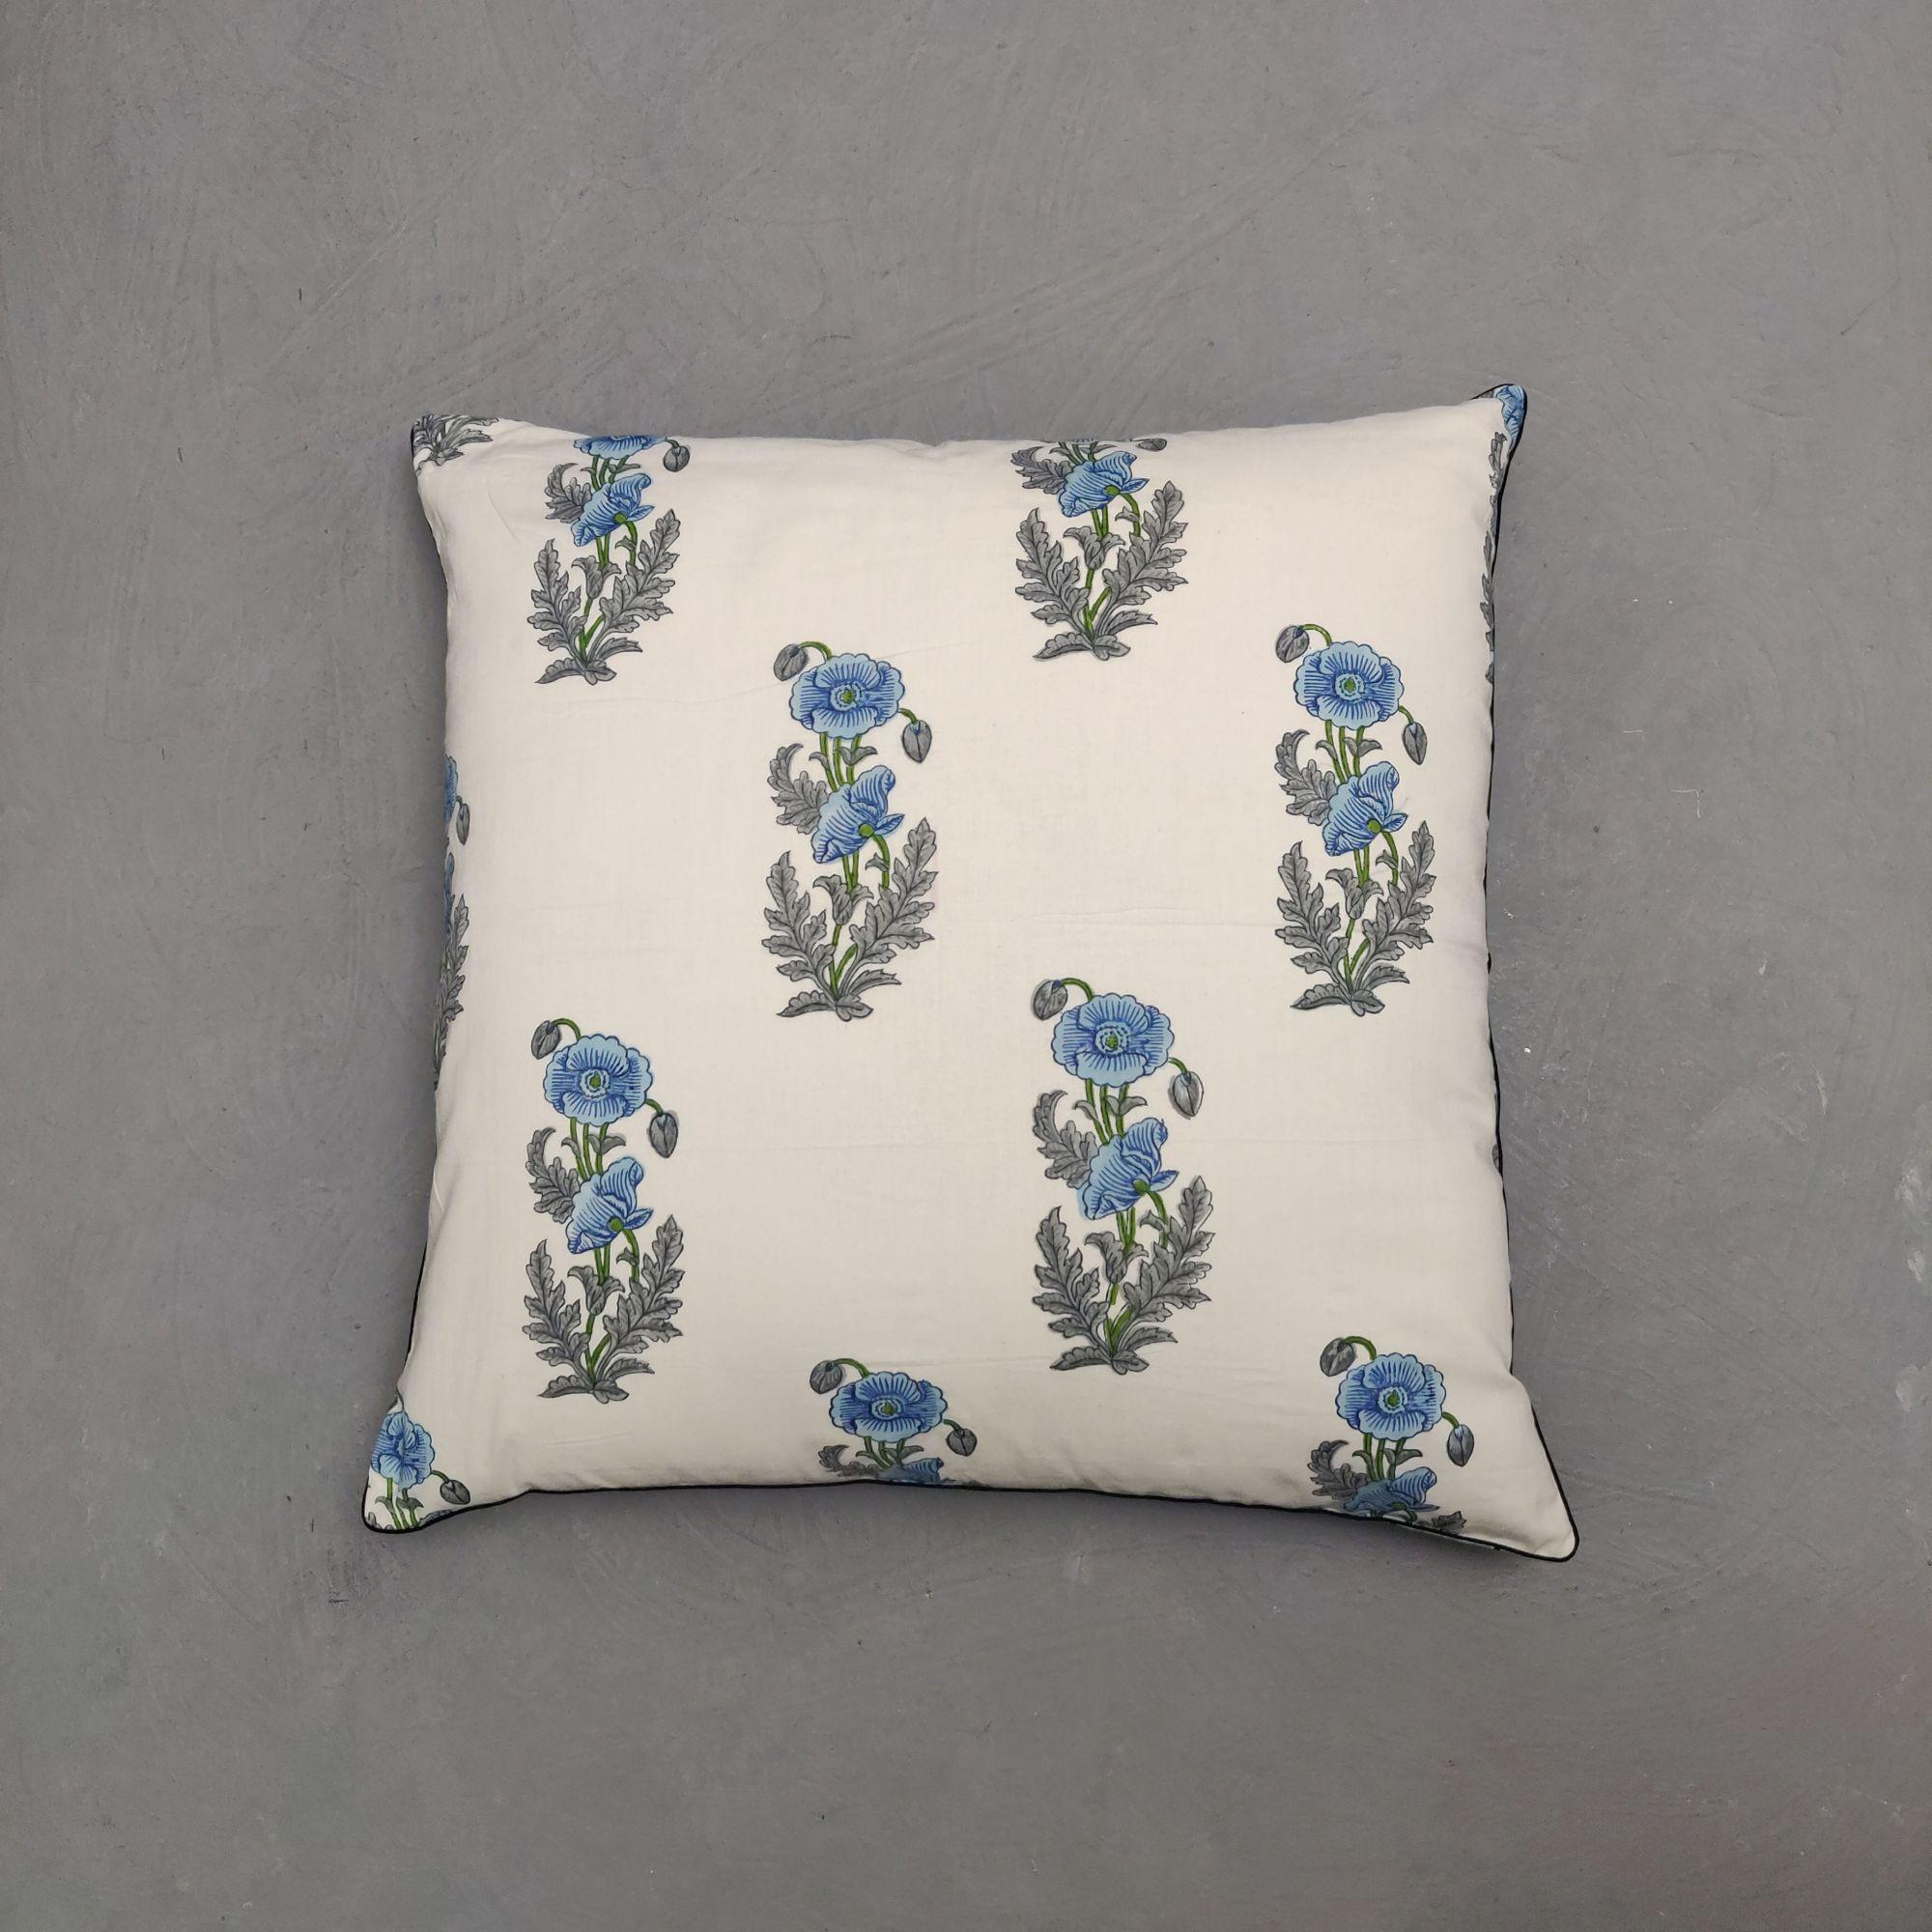 Reversible Handblock Printed Cushion Cover 24CCP159